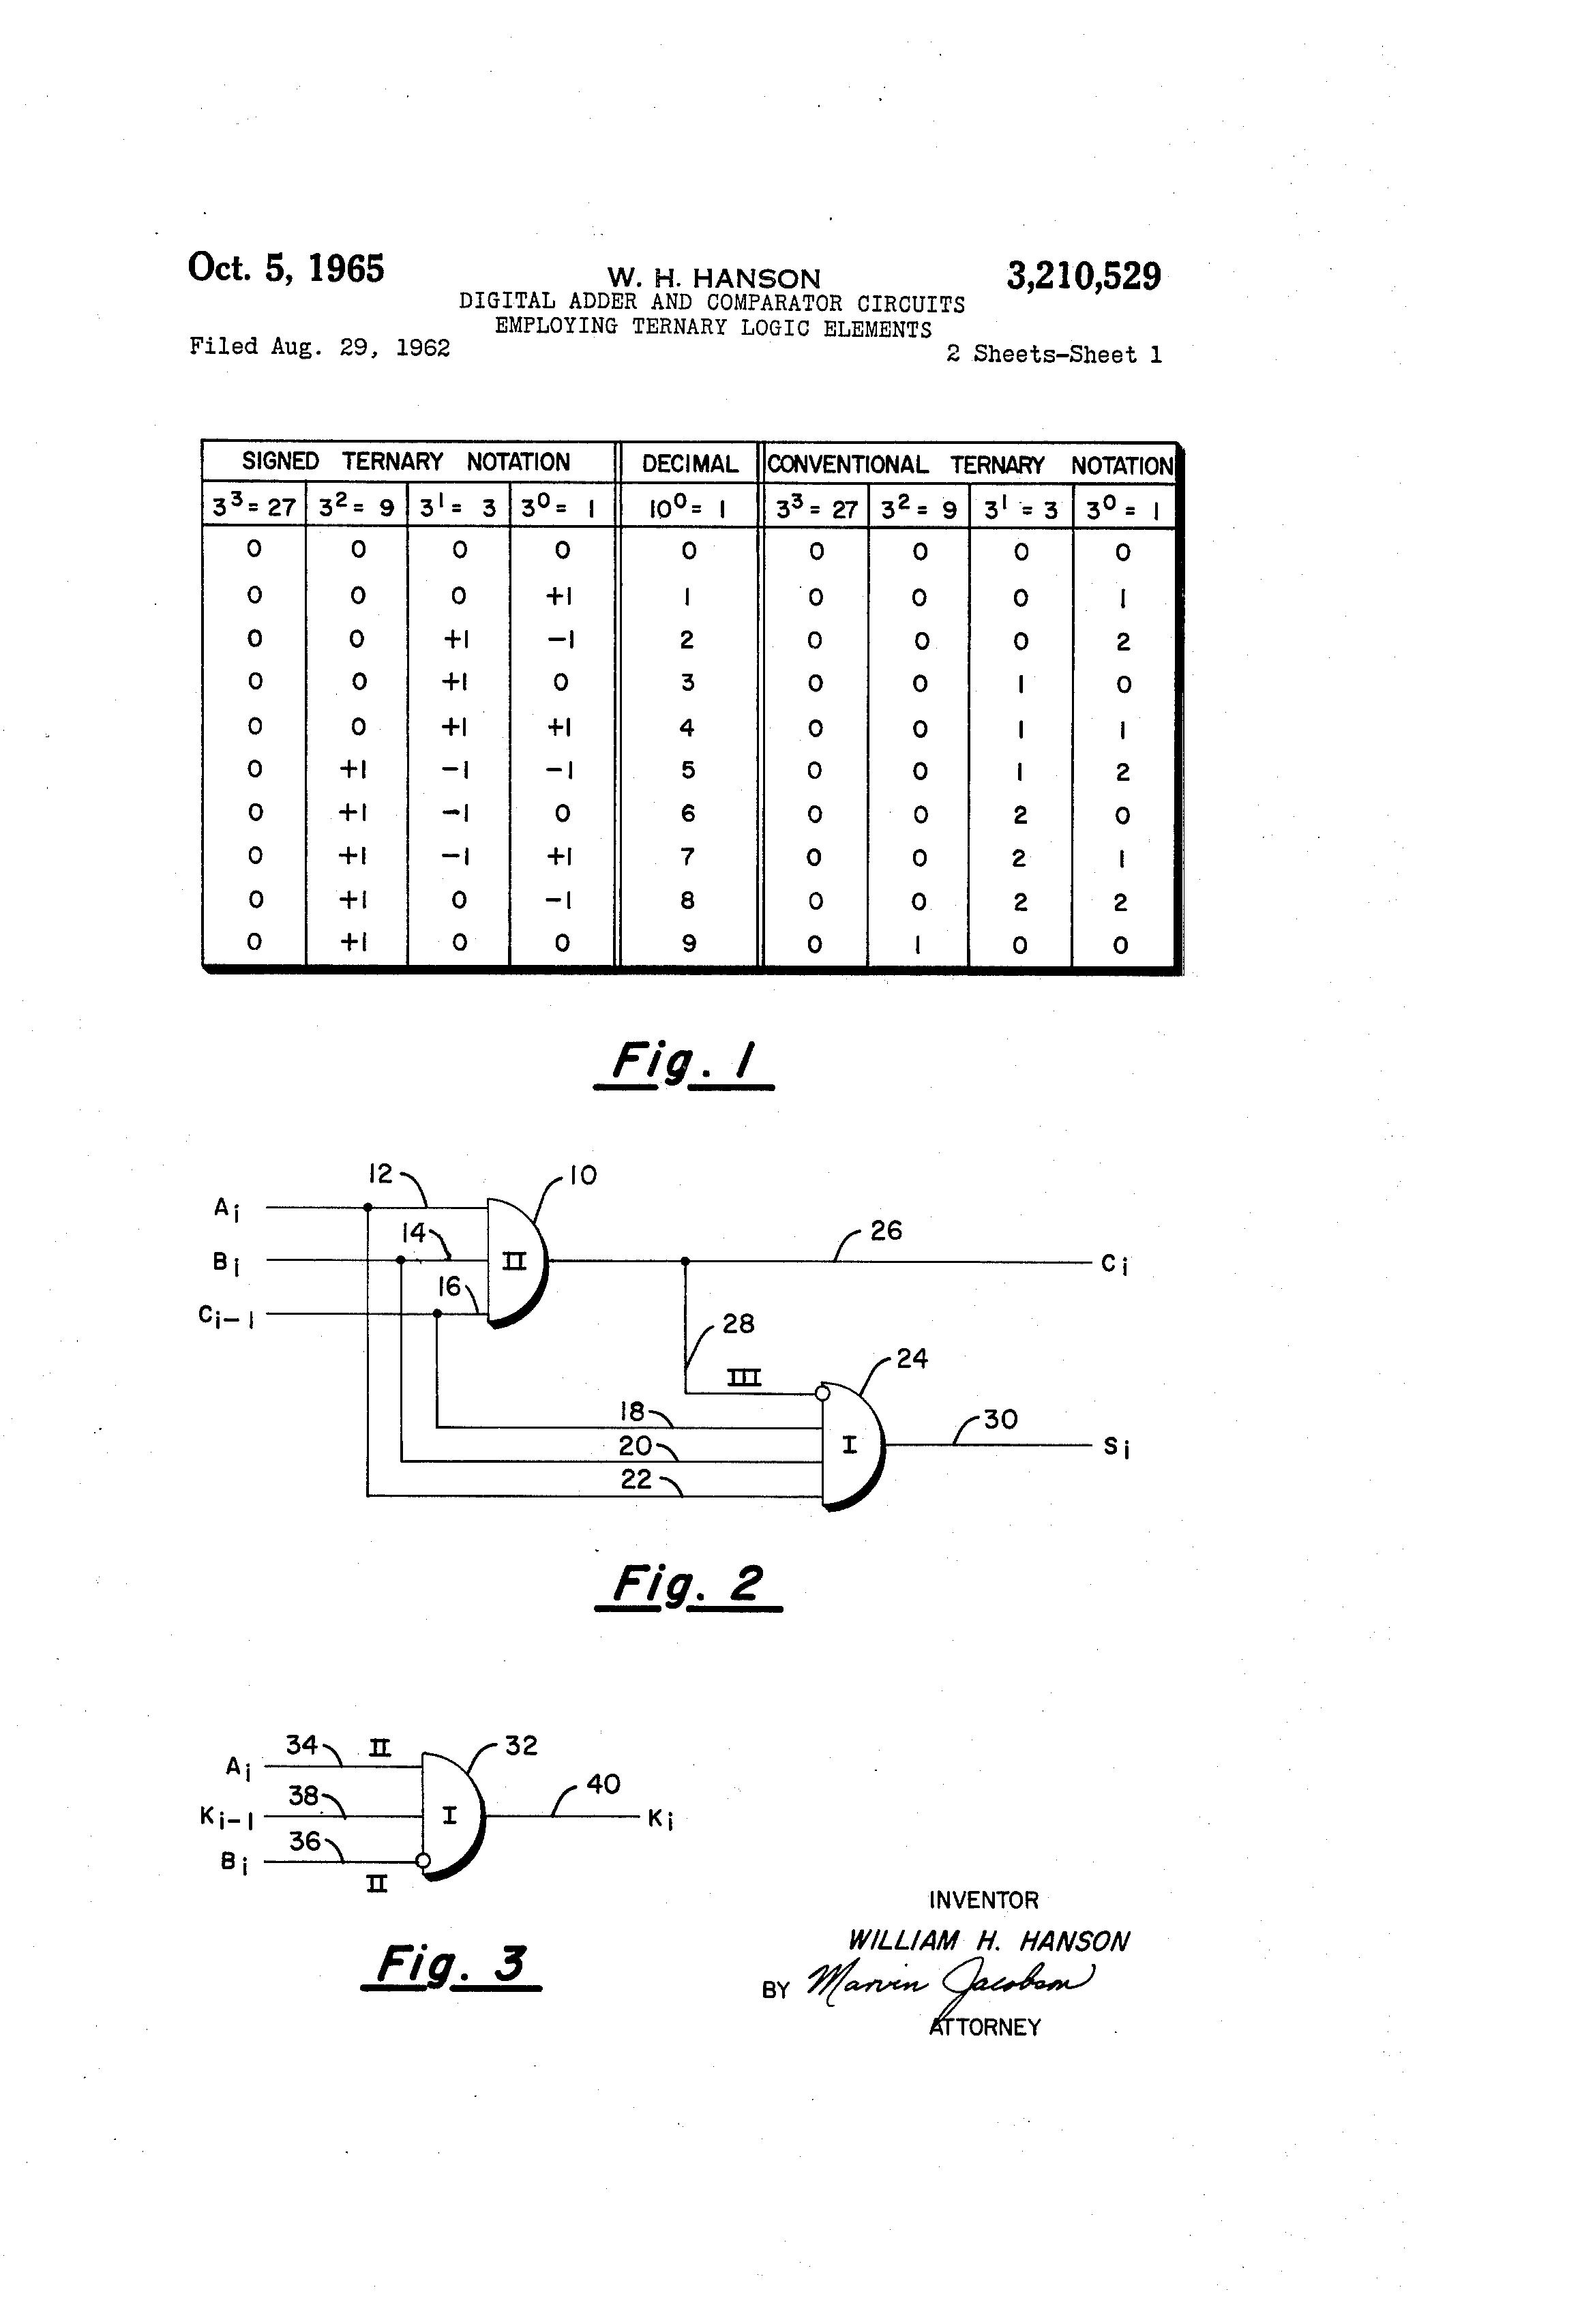 Digital Adder Circuits Best Secret Wiring Diagram Comparator Circuit Patent Us3210529 And Full 2 Bit